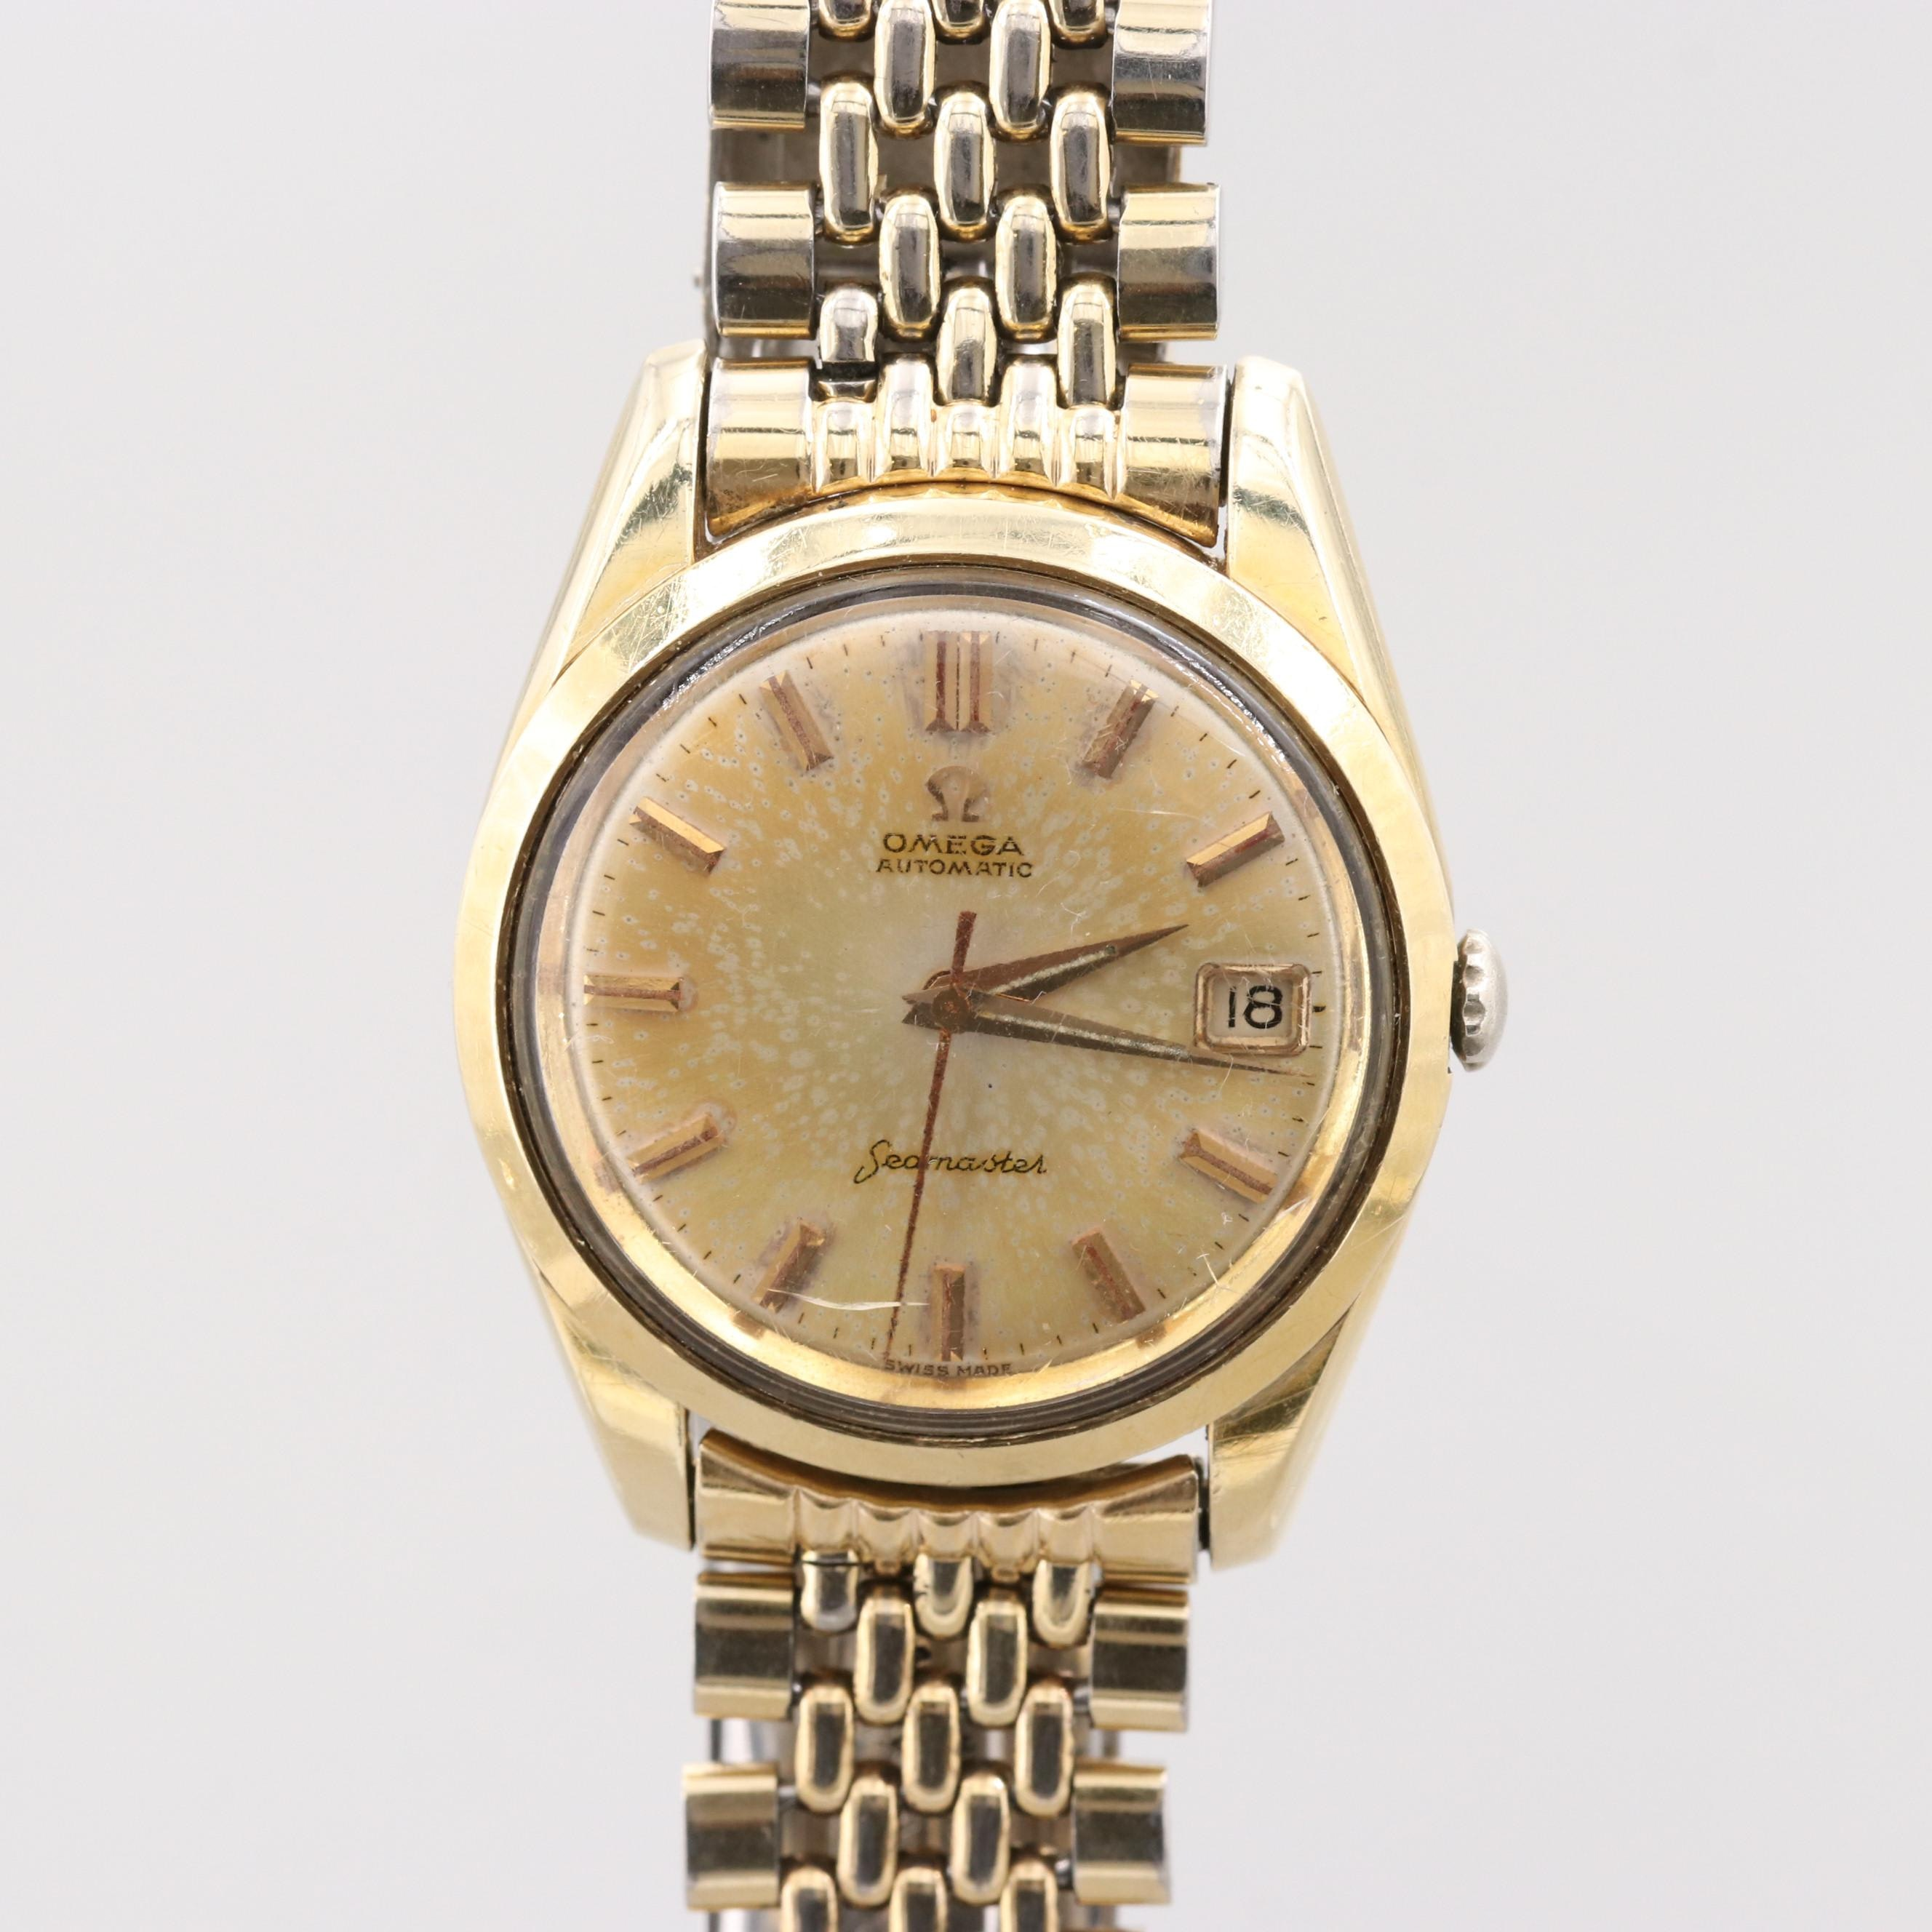 Vintage Omega Seamaster Gold Tone Automatic Wristwatch, Circa 1962